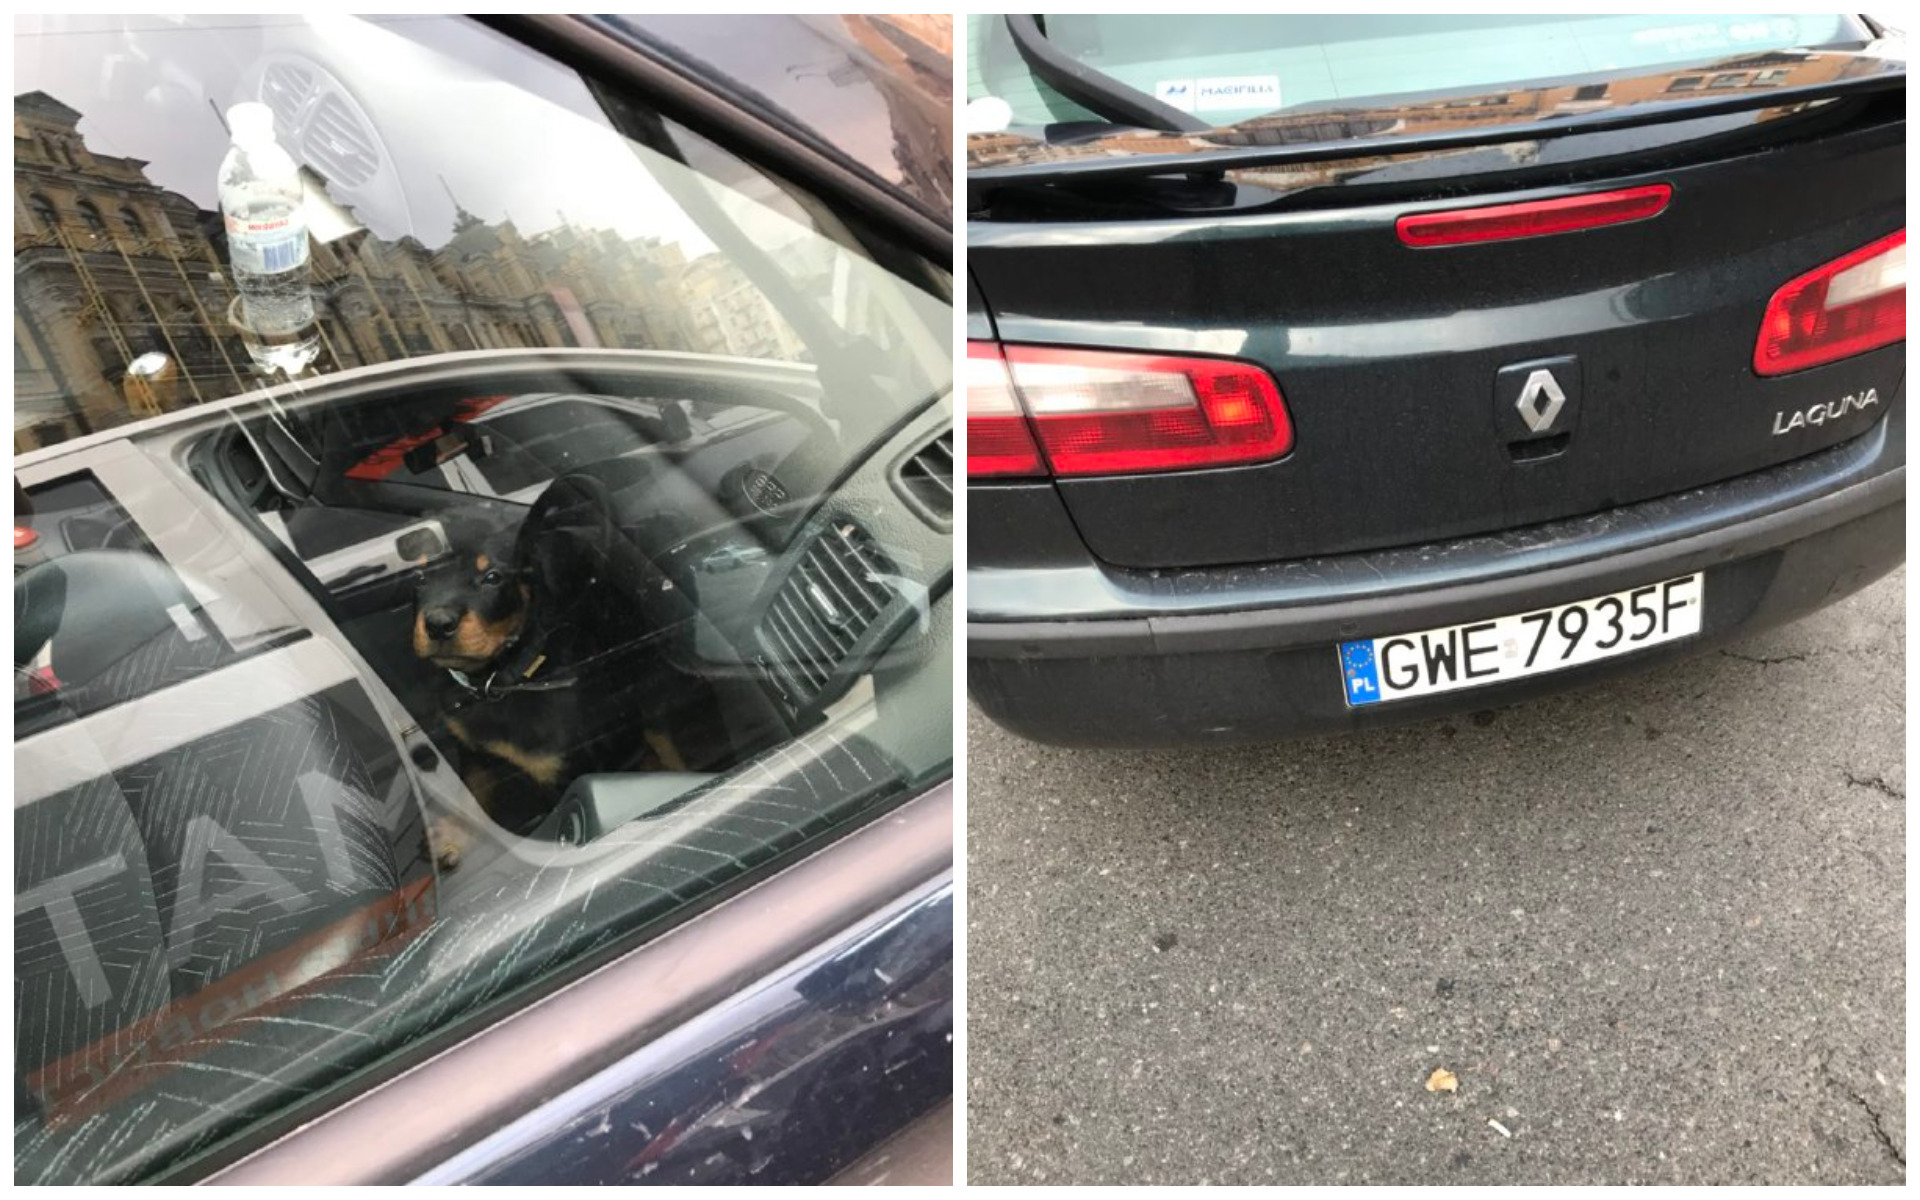 Renault Laguna с номером GWE 7935F